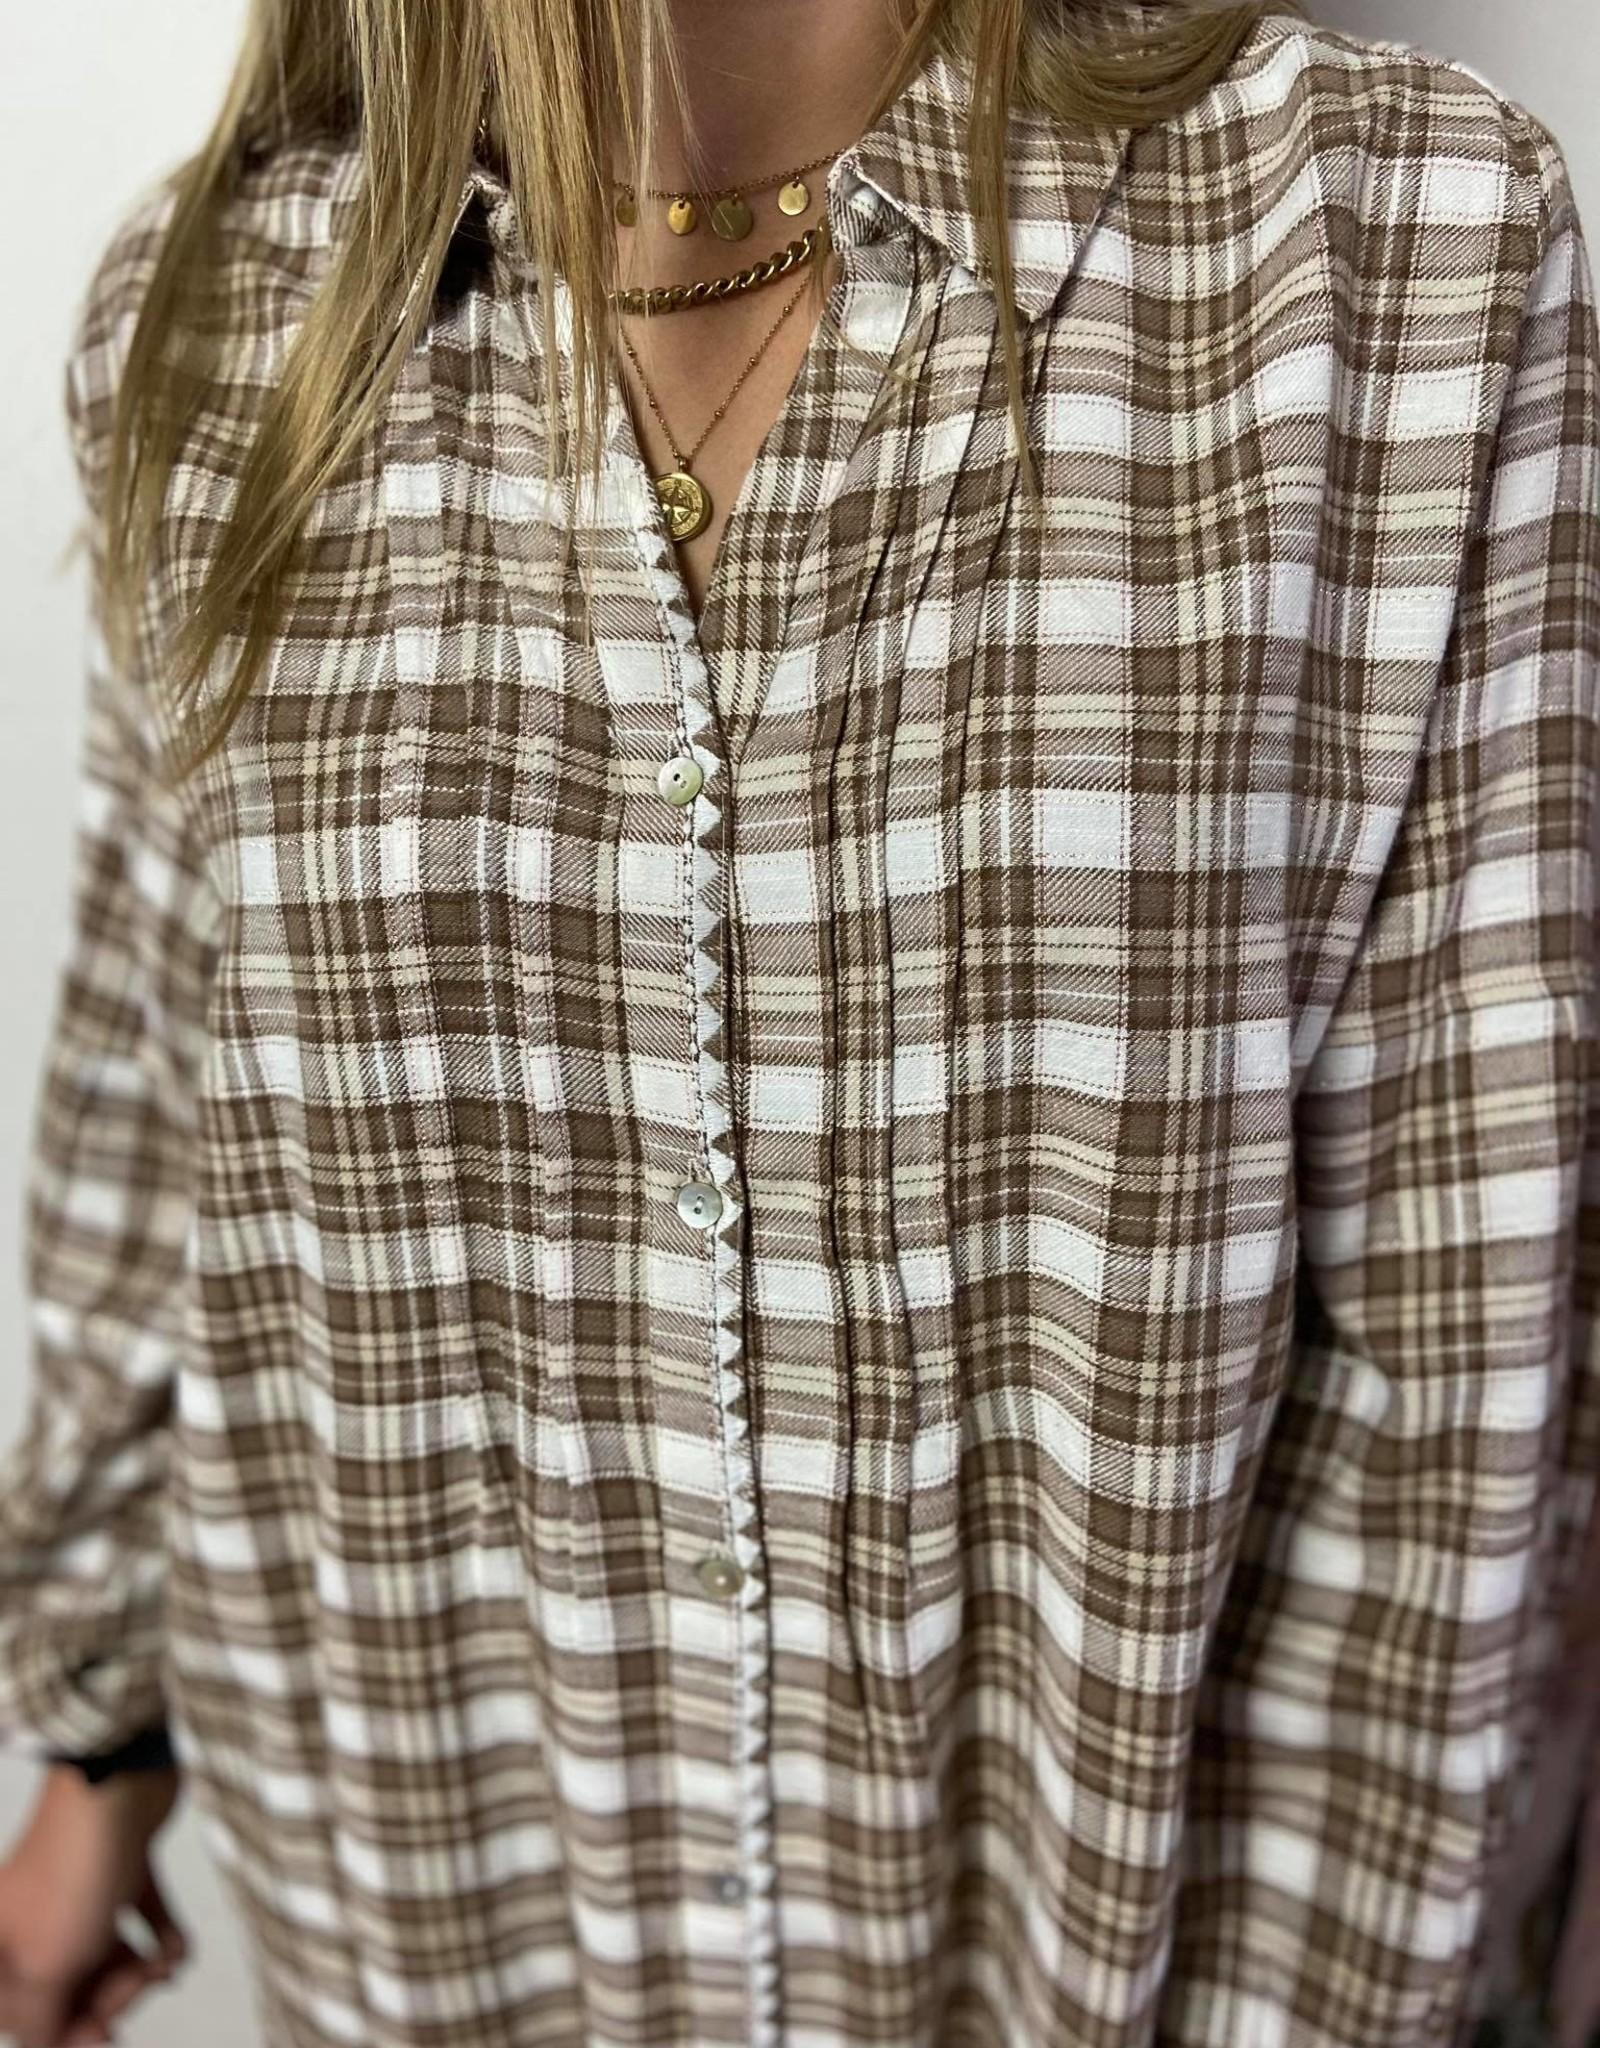 Chekiacr shirt brown check